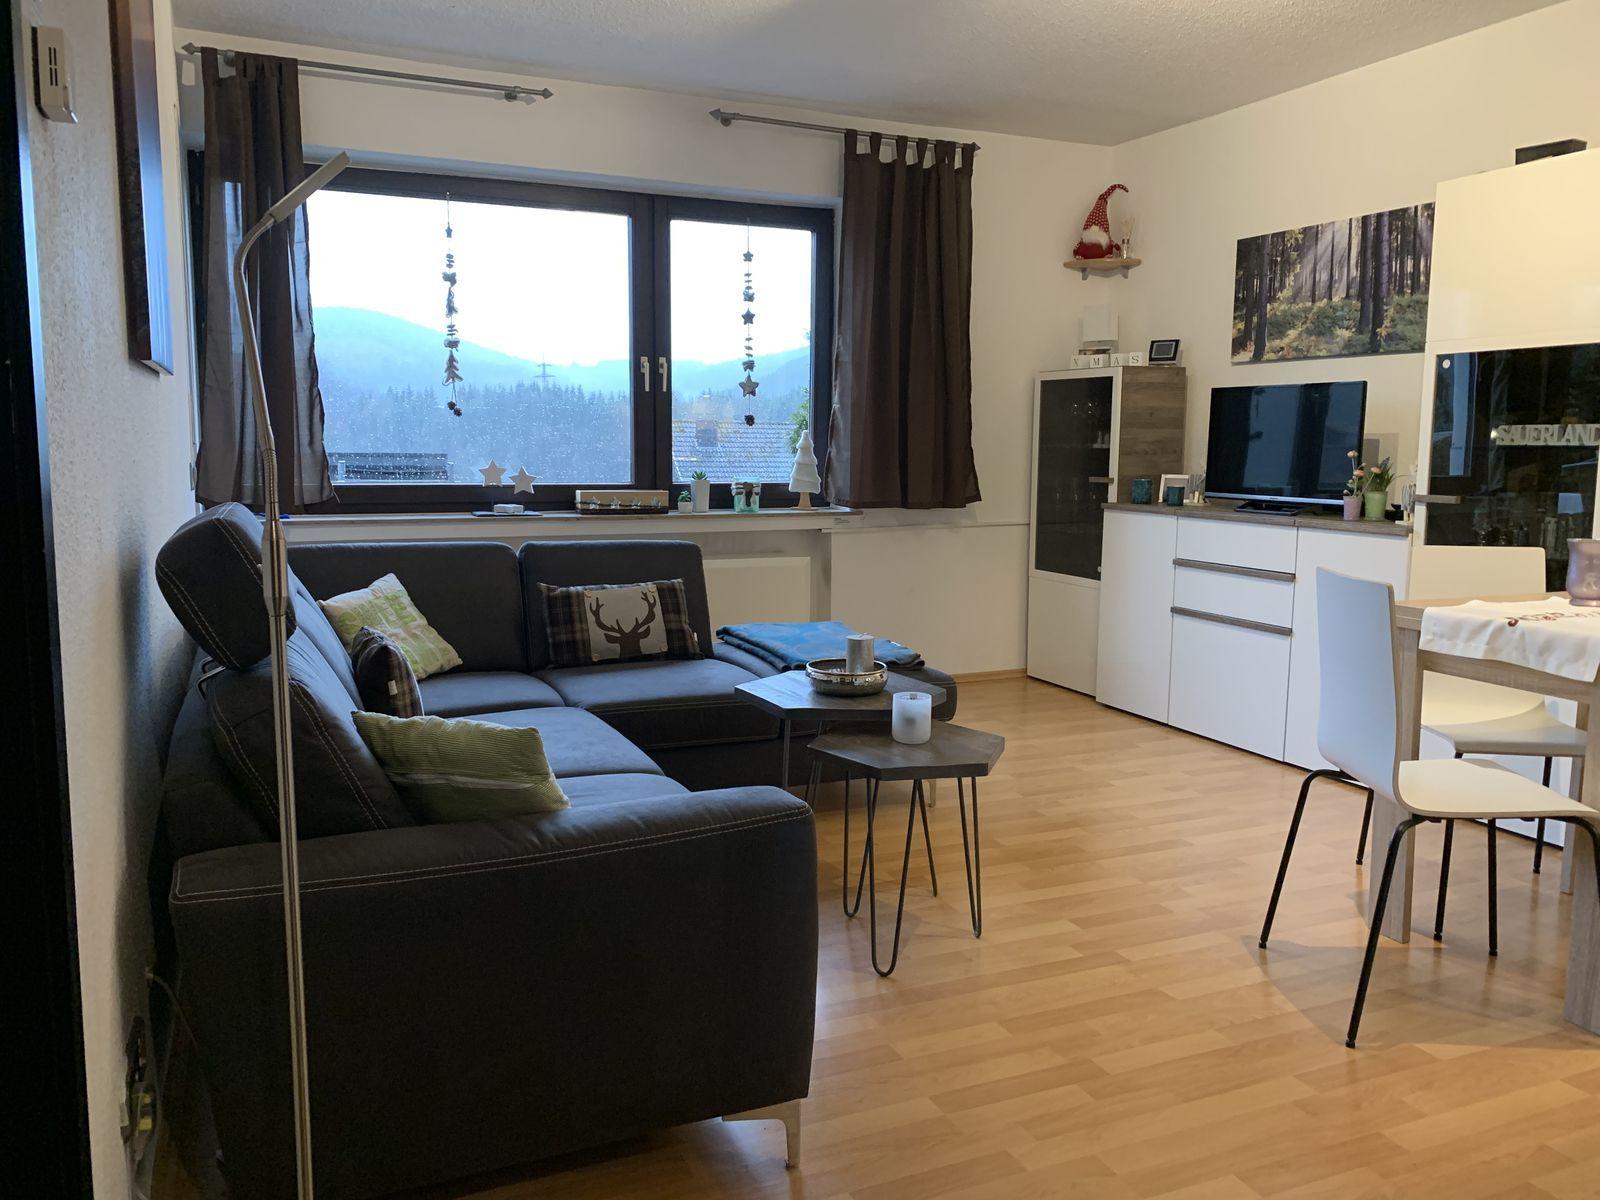 Appartement - Am Kleehagen 5-F